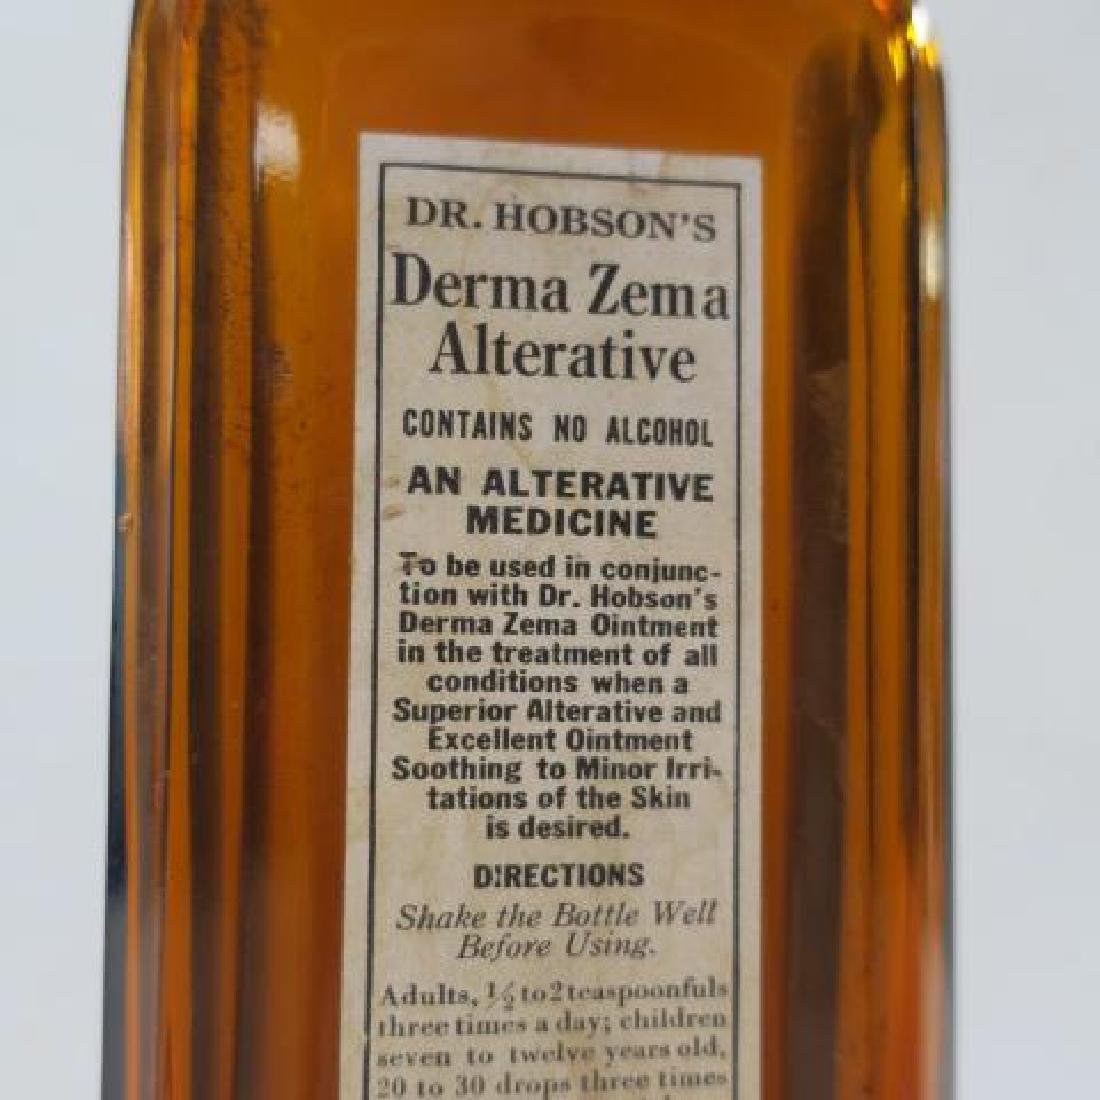 DR HOBSON'S DERMA ZEMA ALTERNATIVE Amber Glass Bottle: - 2